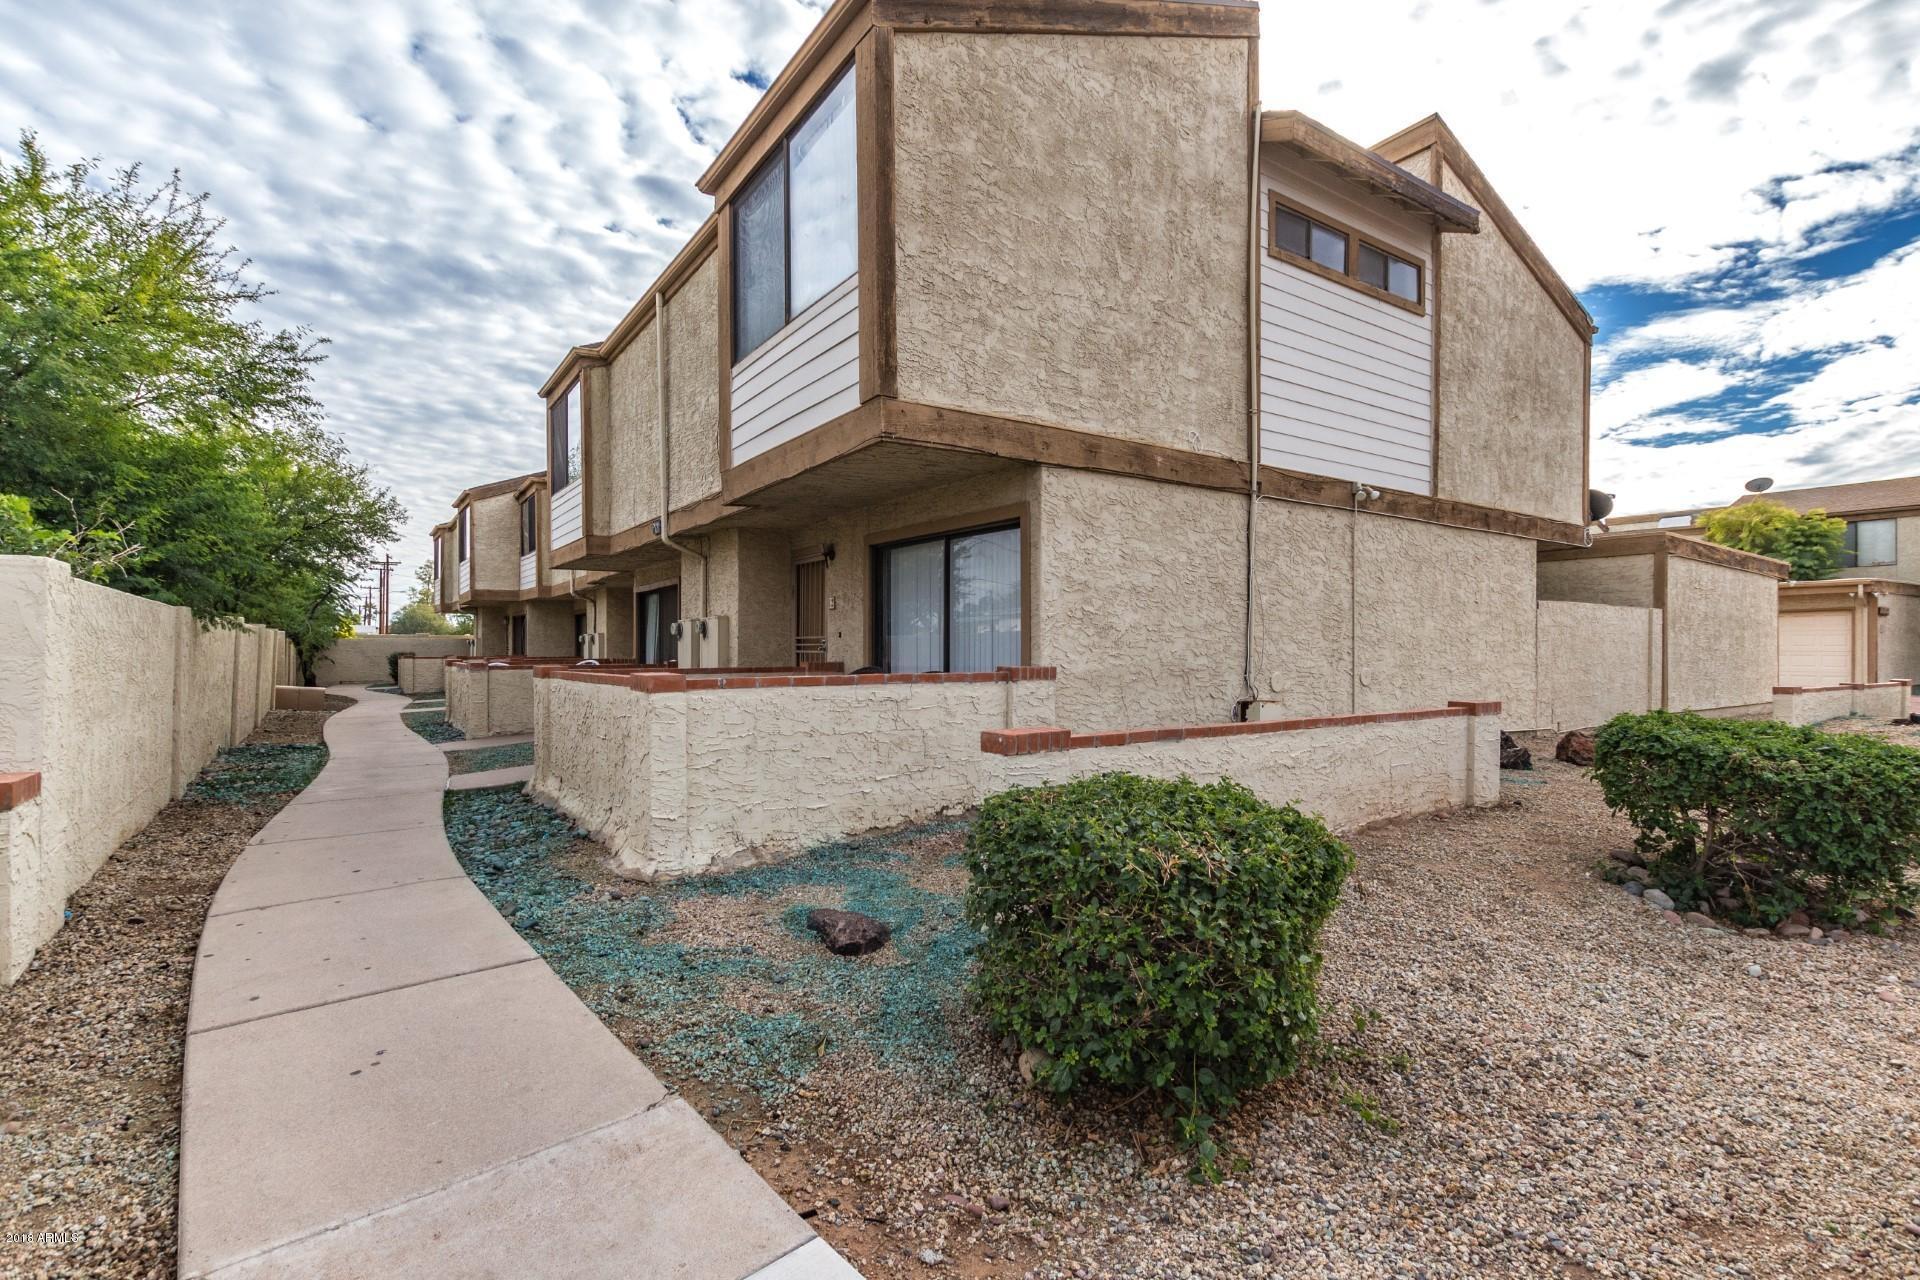 Photo of 3411 N 12TH Place #10, Phoenix, AZ 85014